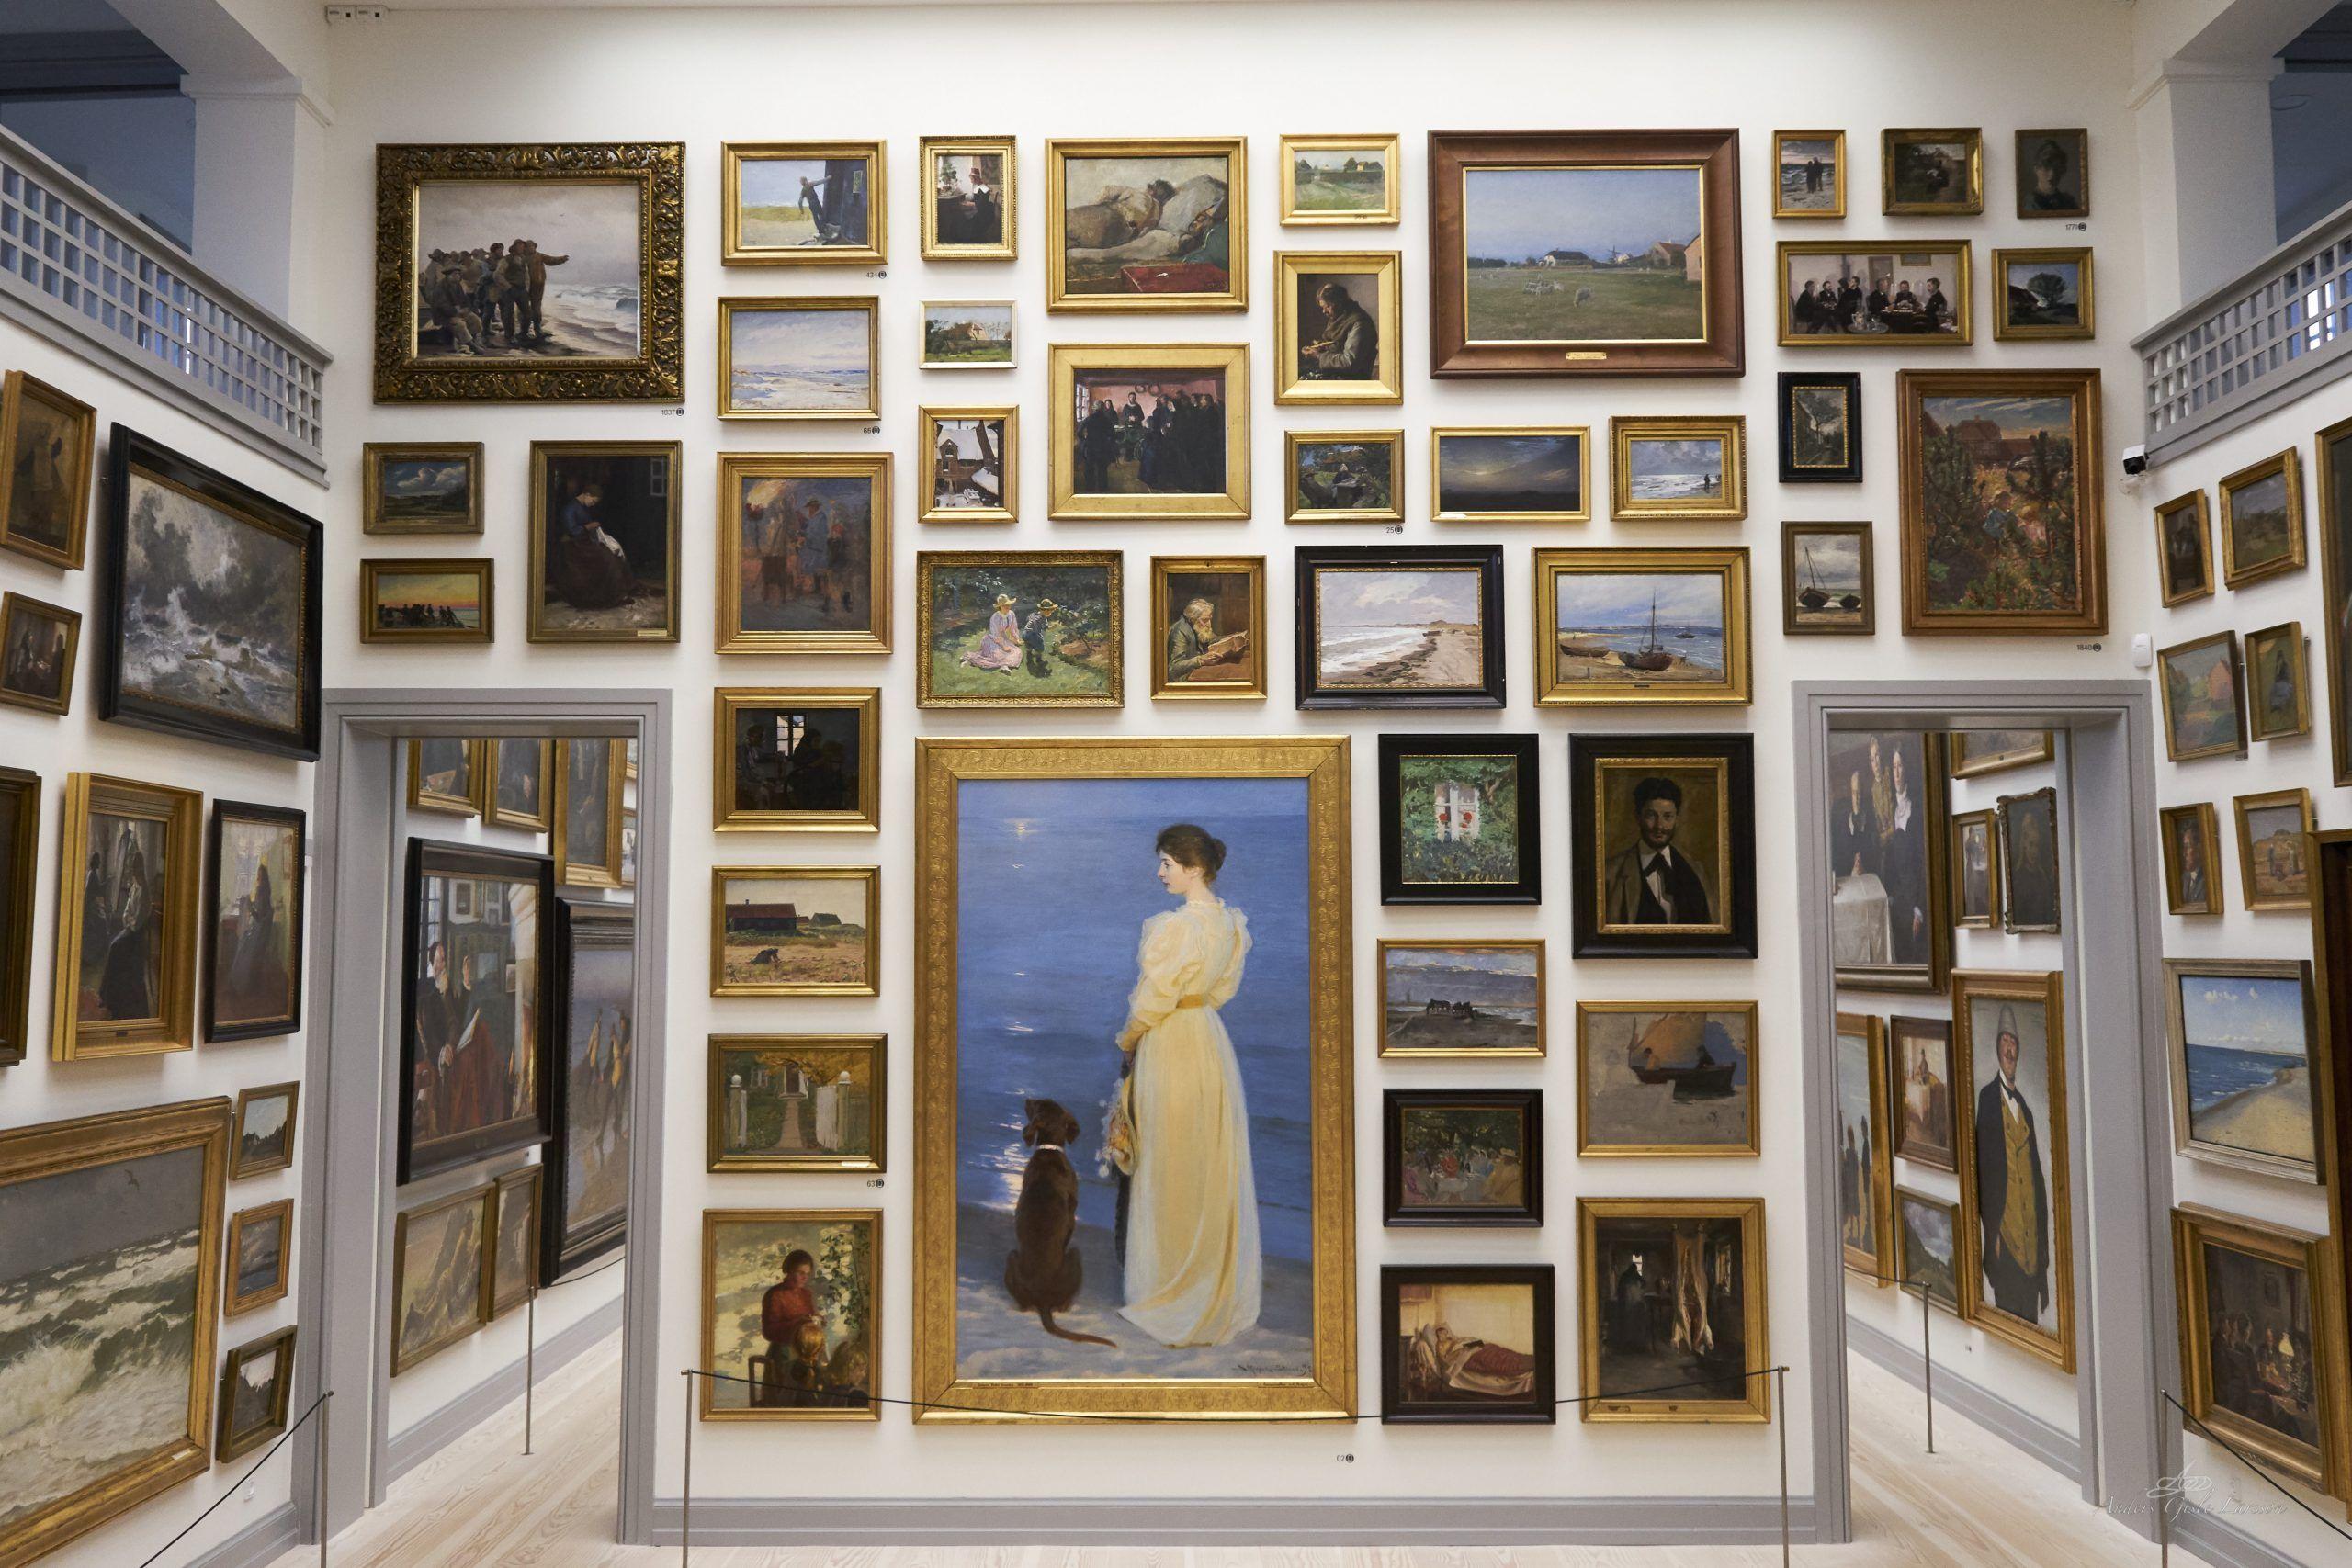 6/365, Skagen Kunst Museum, Nordjylland